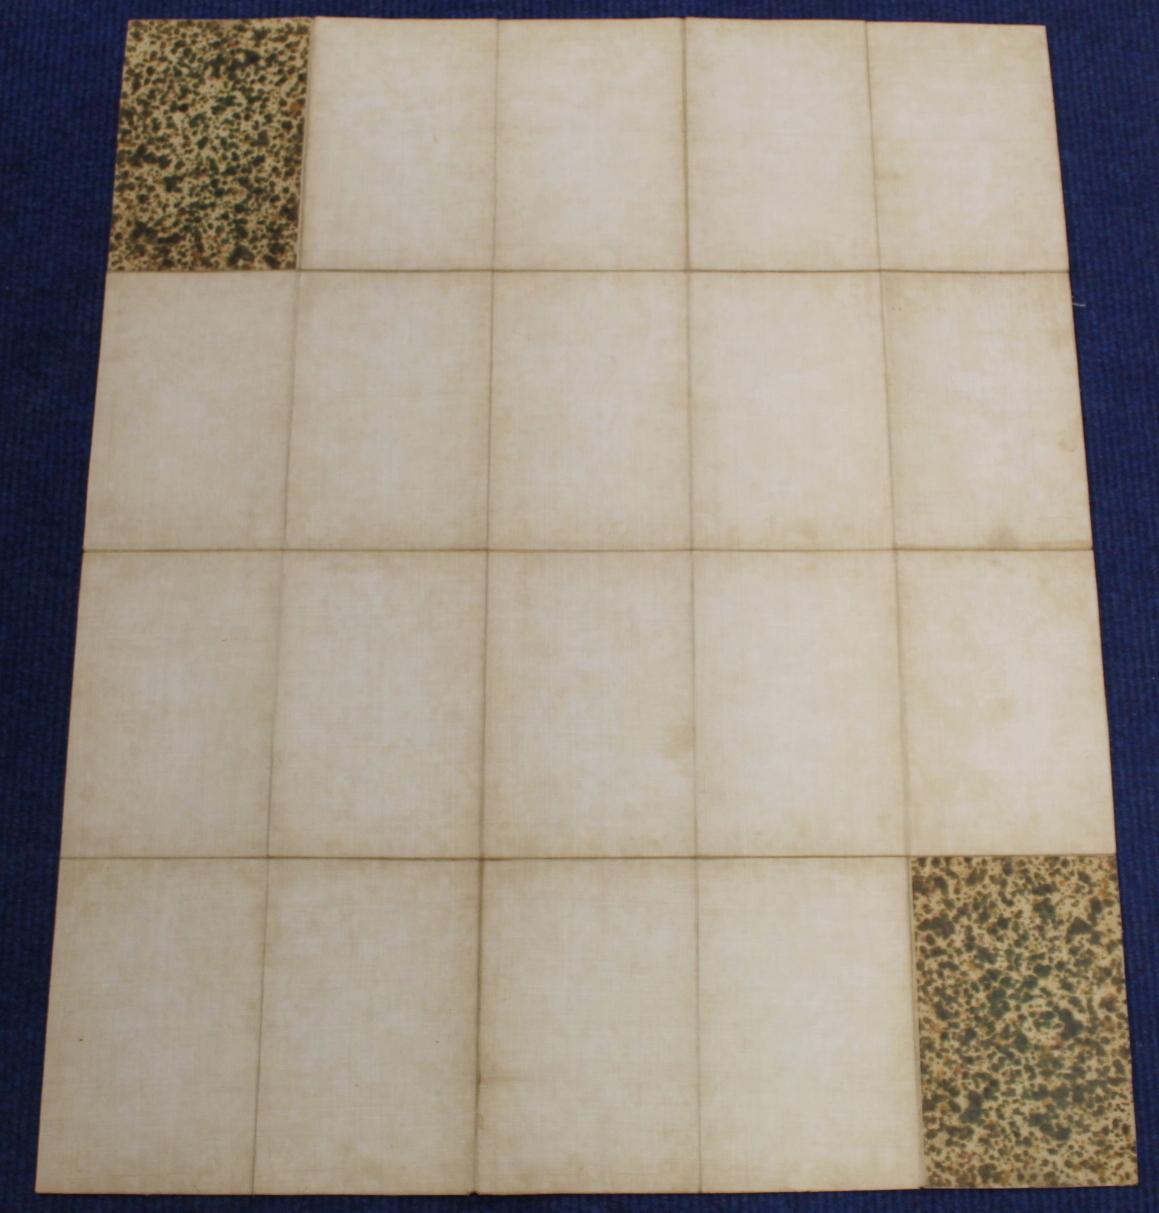 KIRKWOOD J. & SONS.Map of Scotland. Hand col. eng. fldg. linen map in well worn orig. slip case. - Image 36 of 36